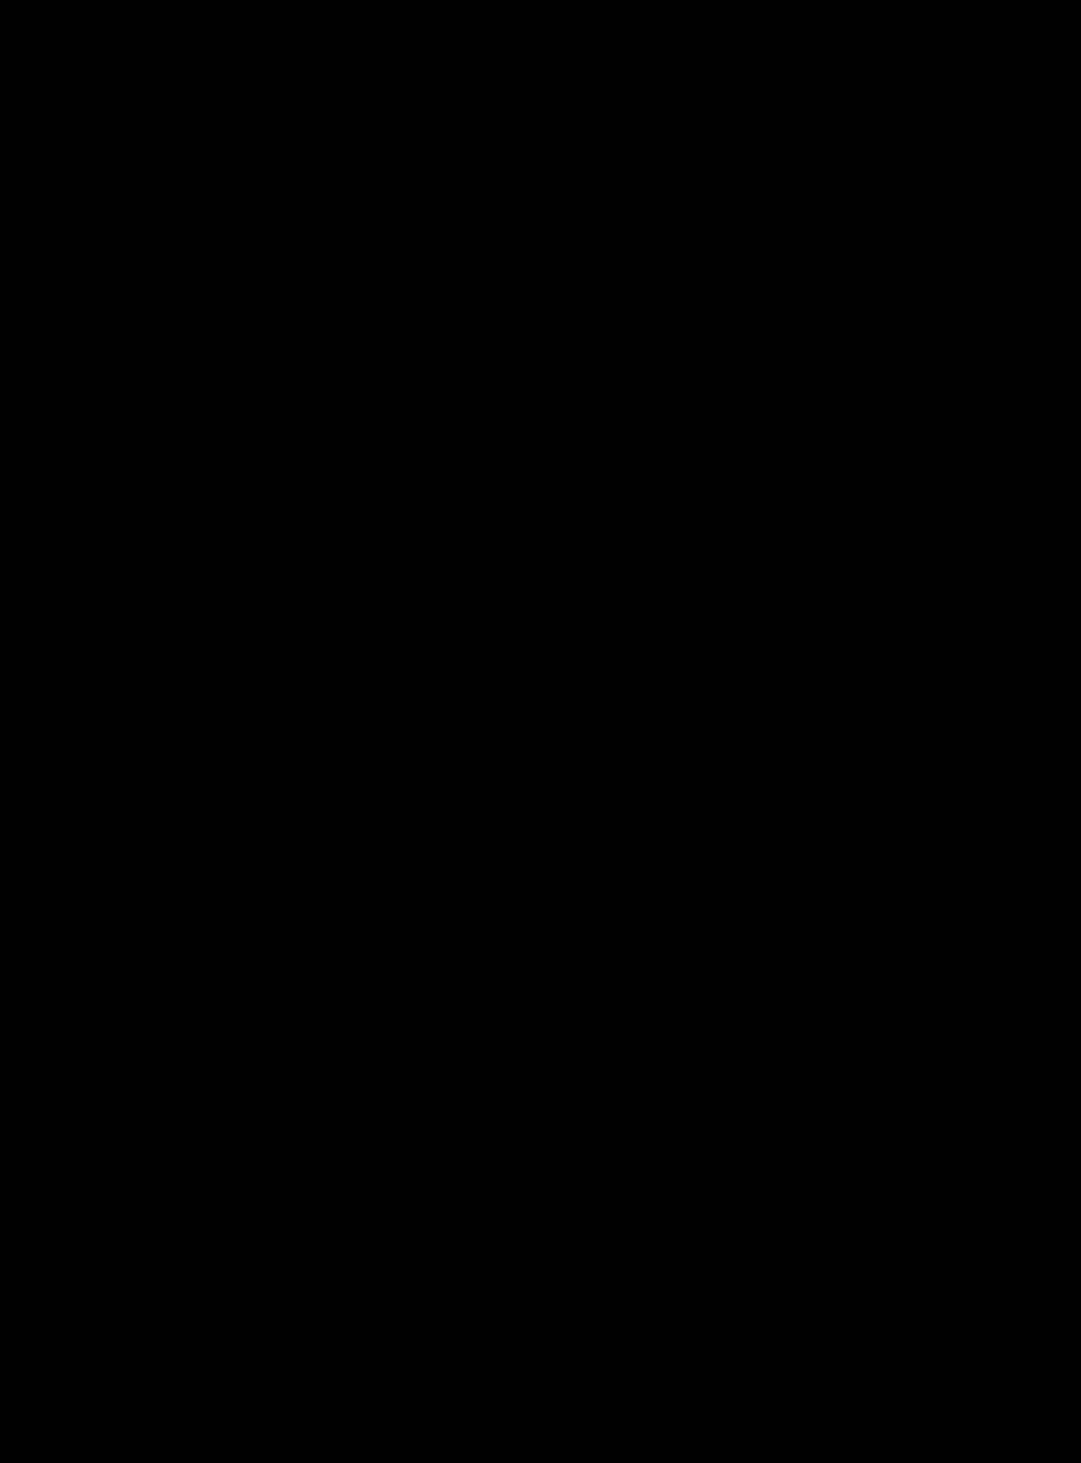 Google Slides Icon Google Slides Black Icon Clipart Full Size